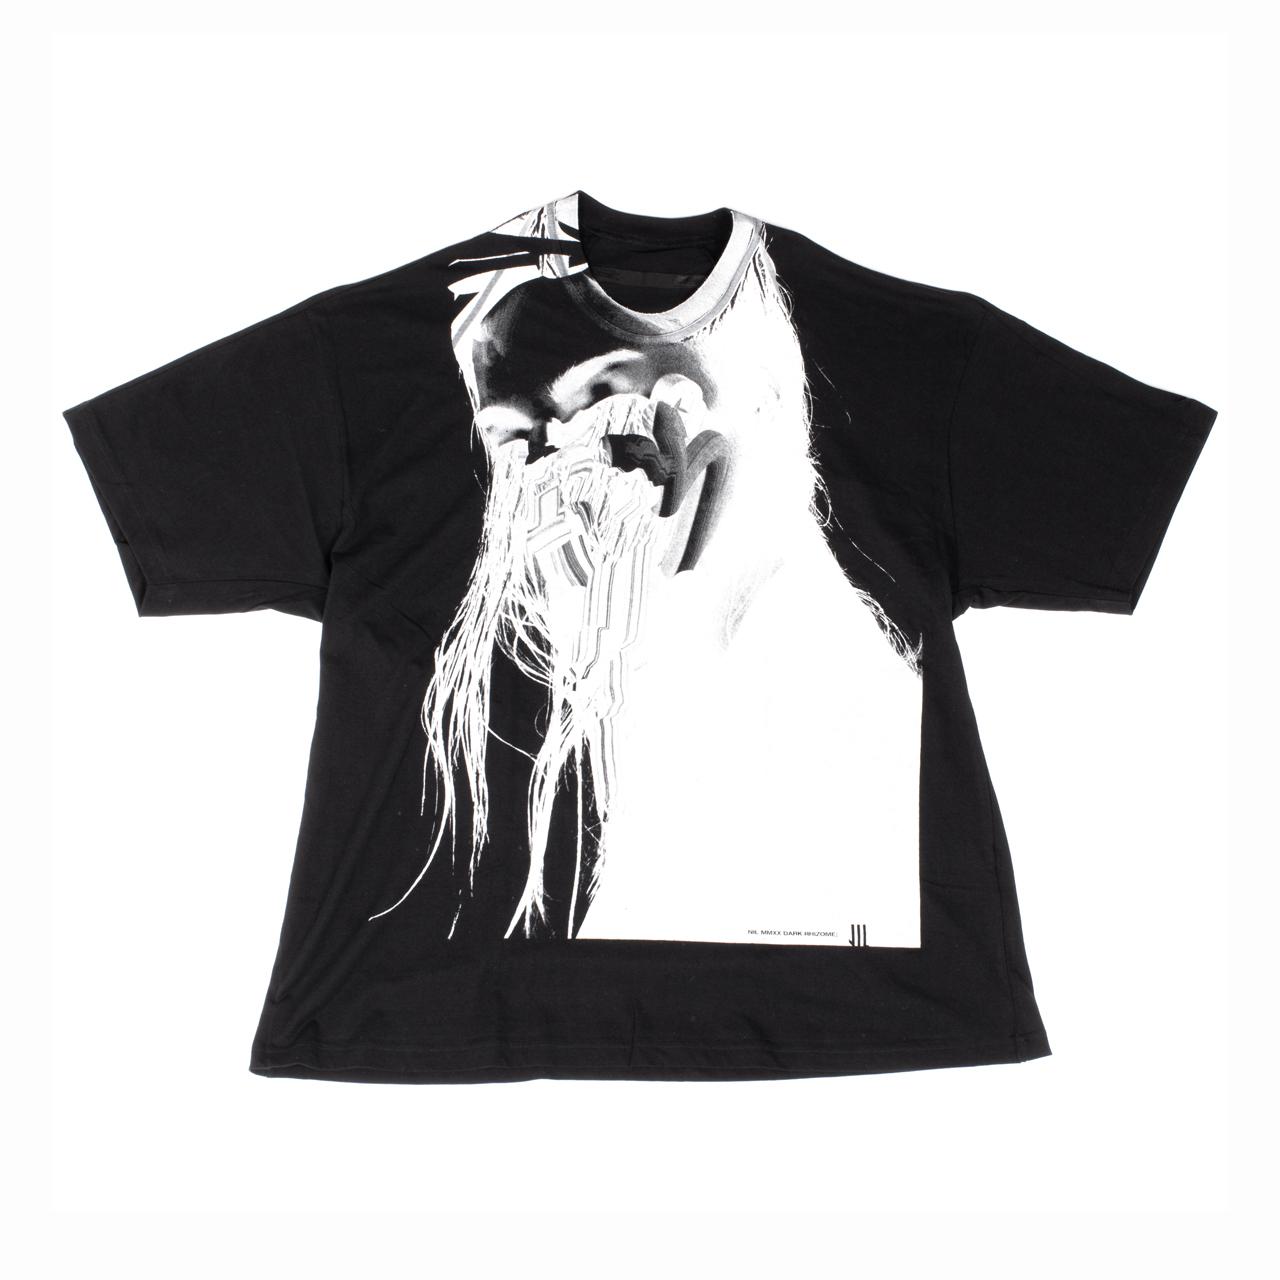 701CPM12-BLACK / Jesse Draxler プリント Tシャツ ver.2